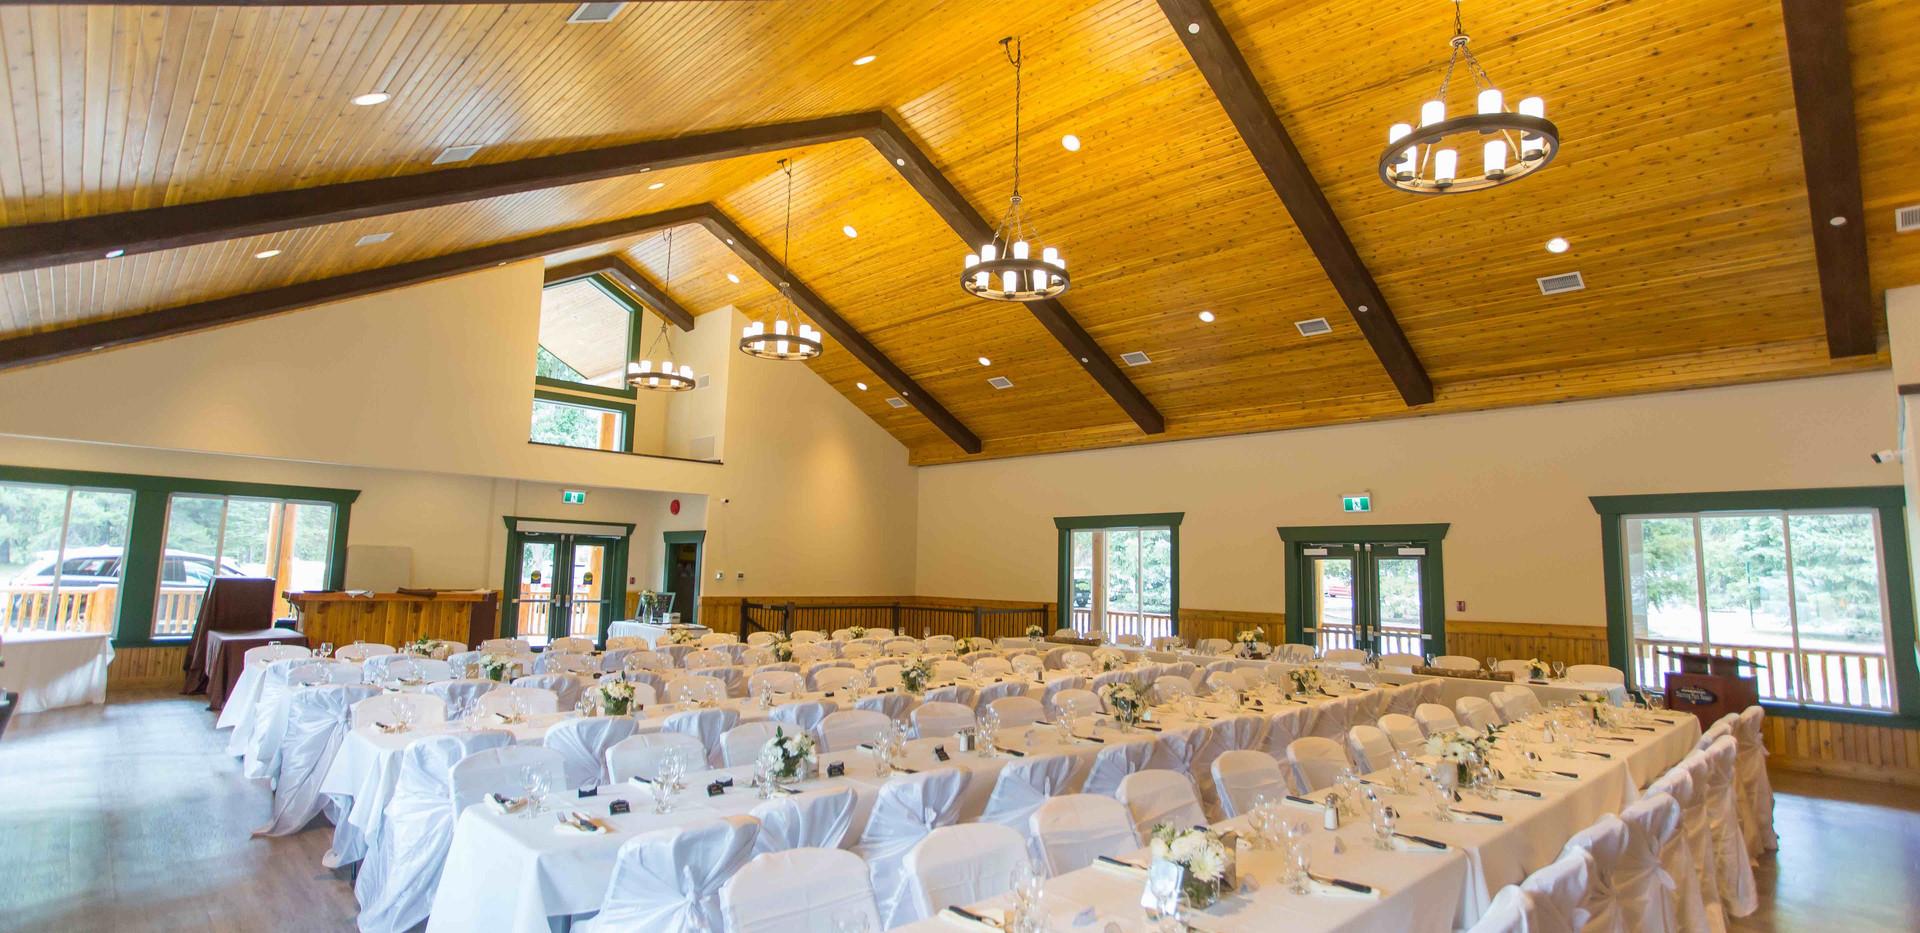 manning_alpine_room_wedding-1-1mb-3.jpg